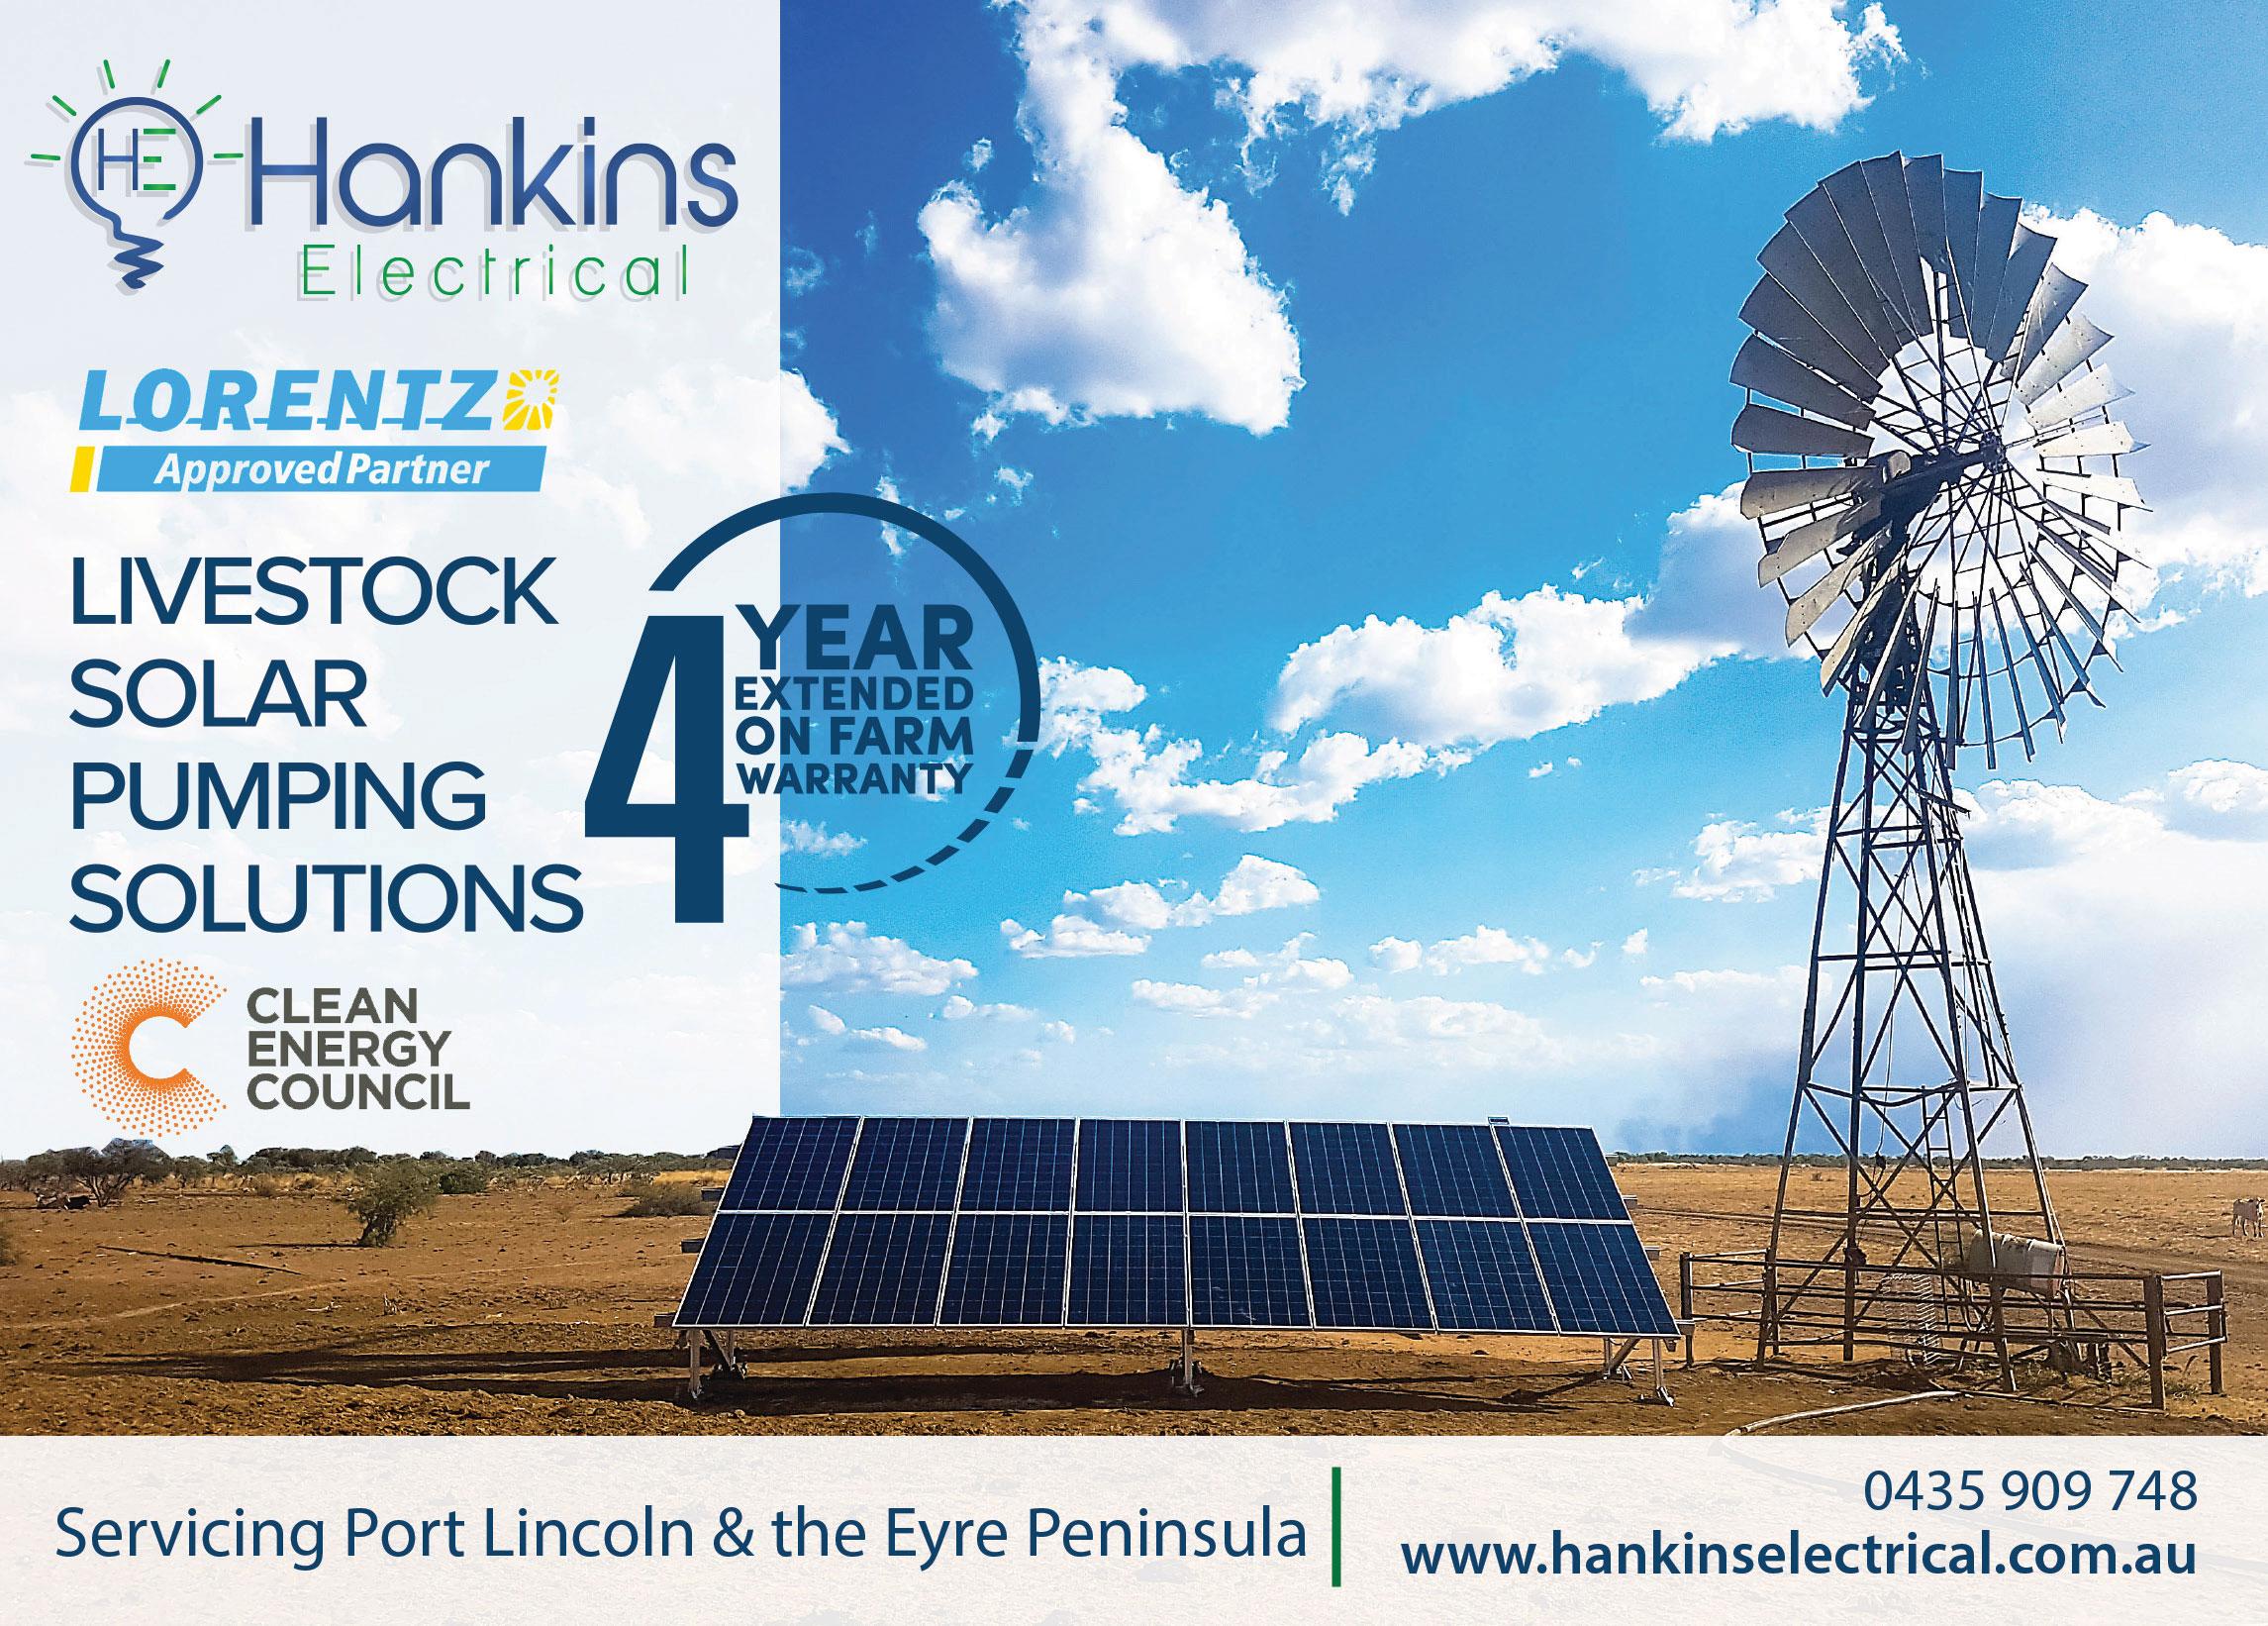 Lorentz Livestock Solar Pumps